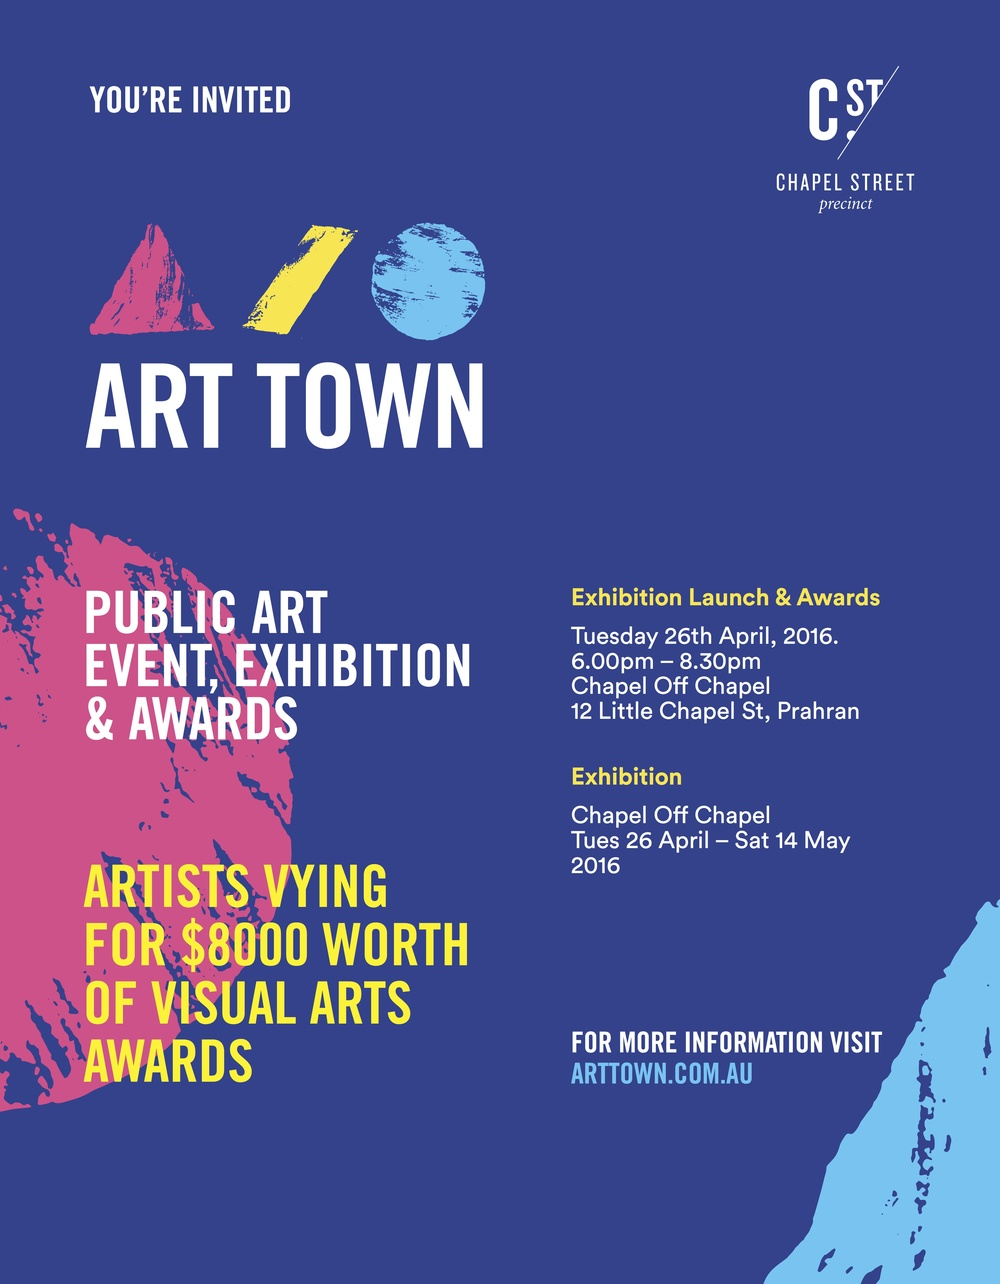 Art Town invite